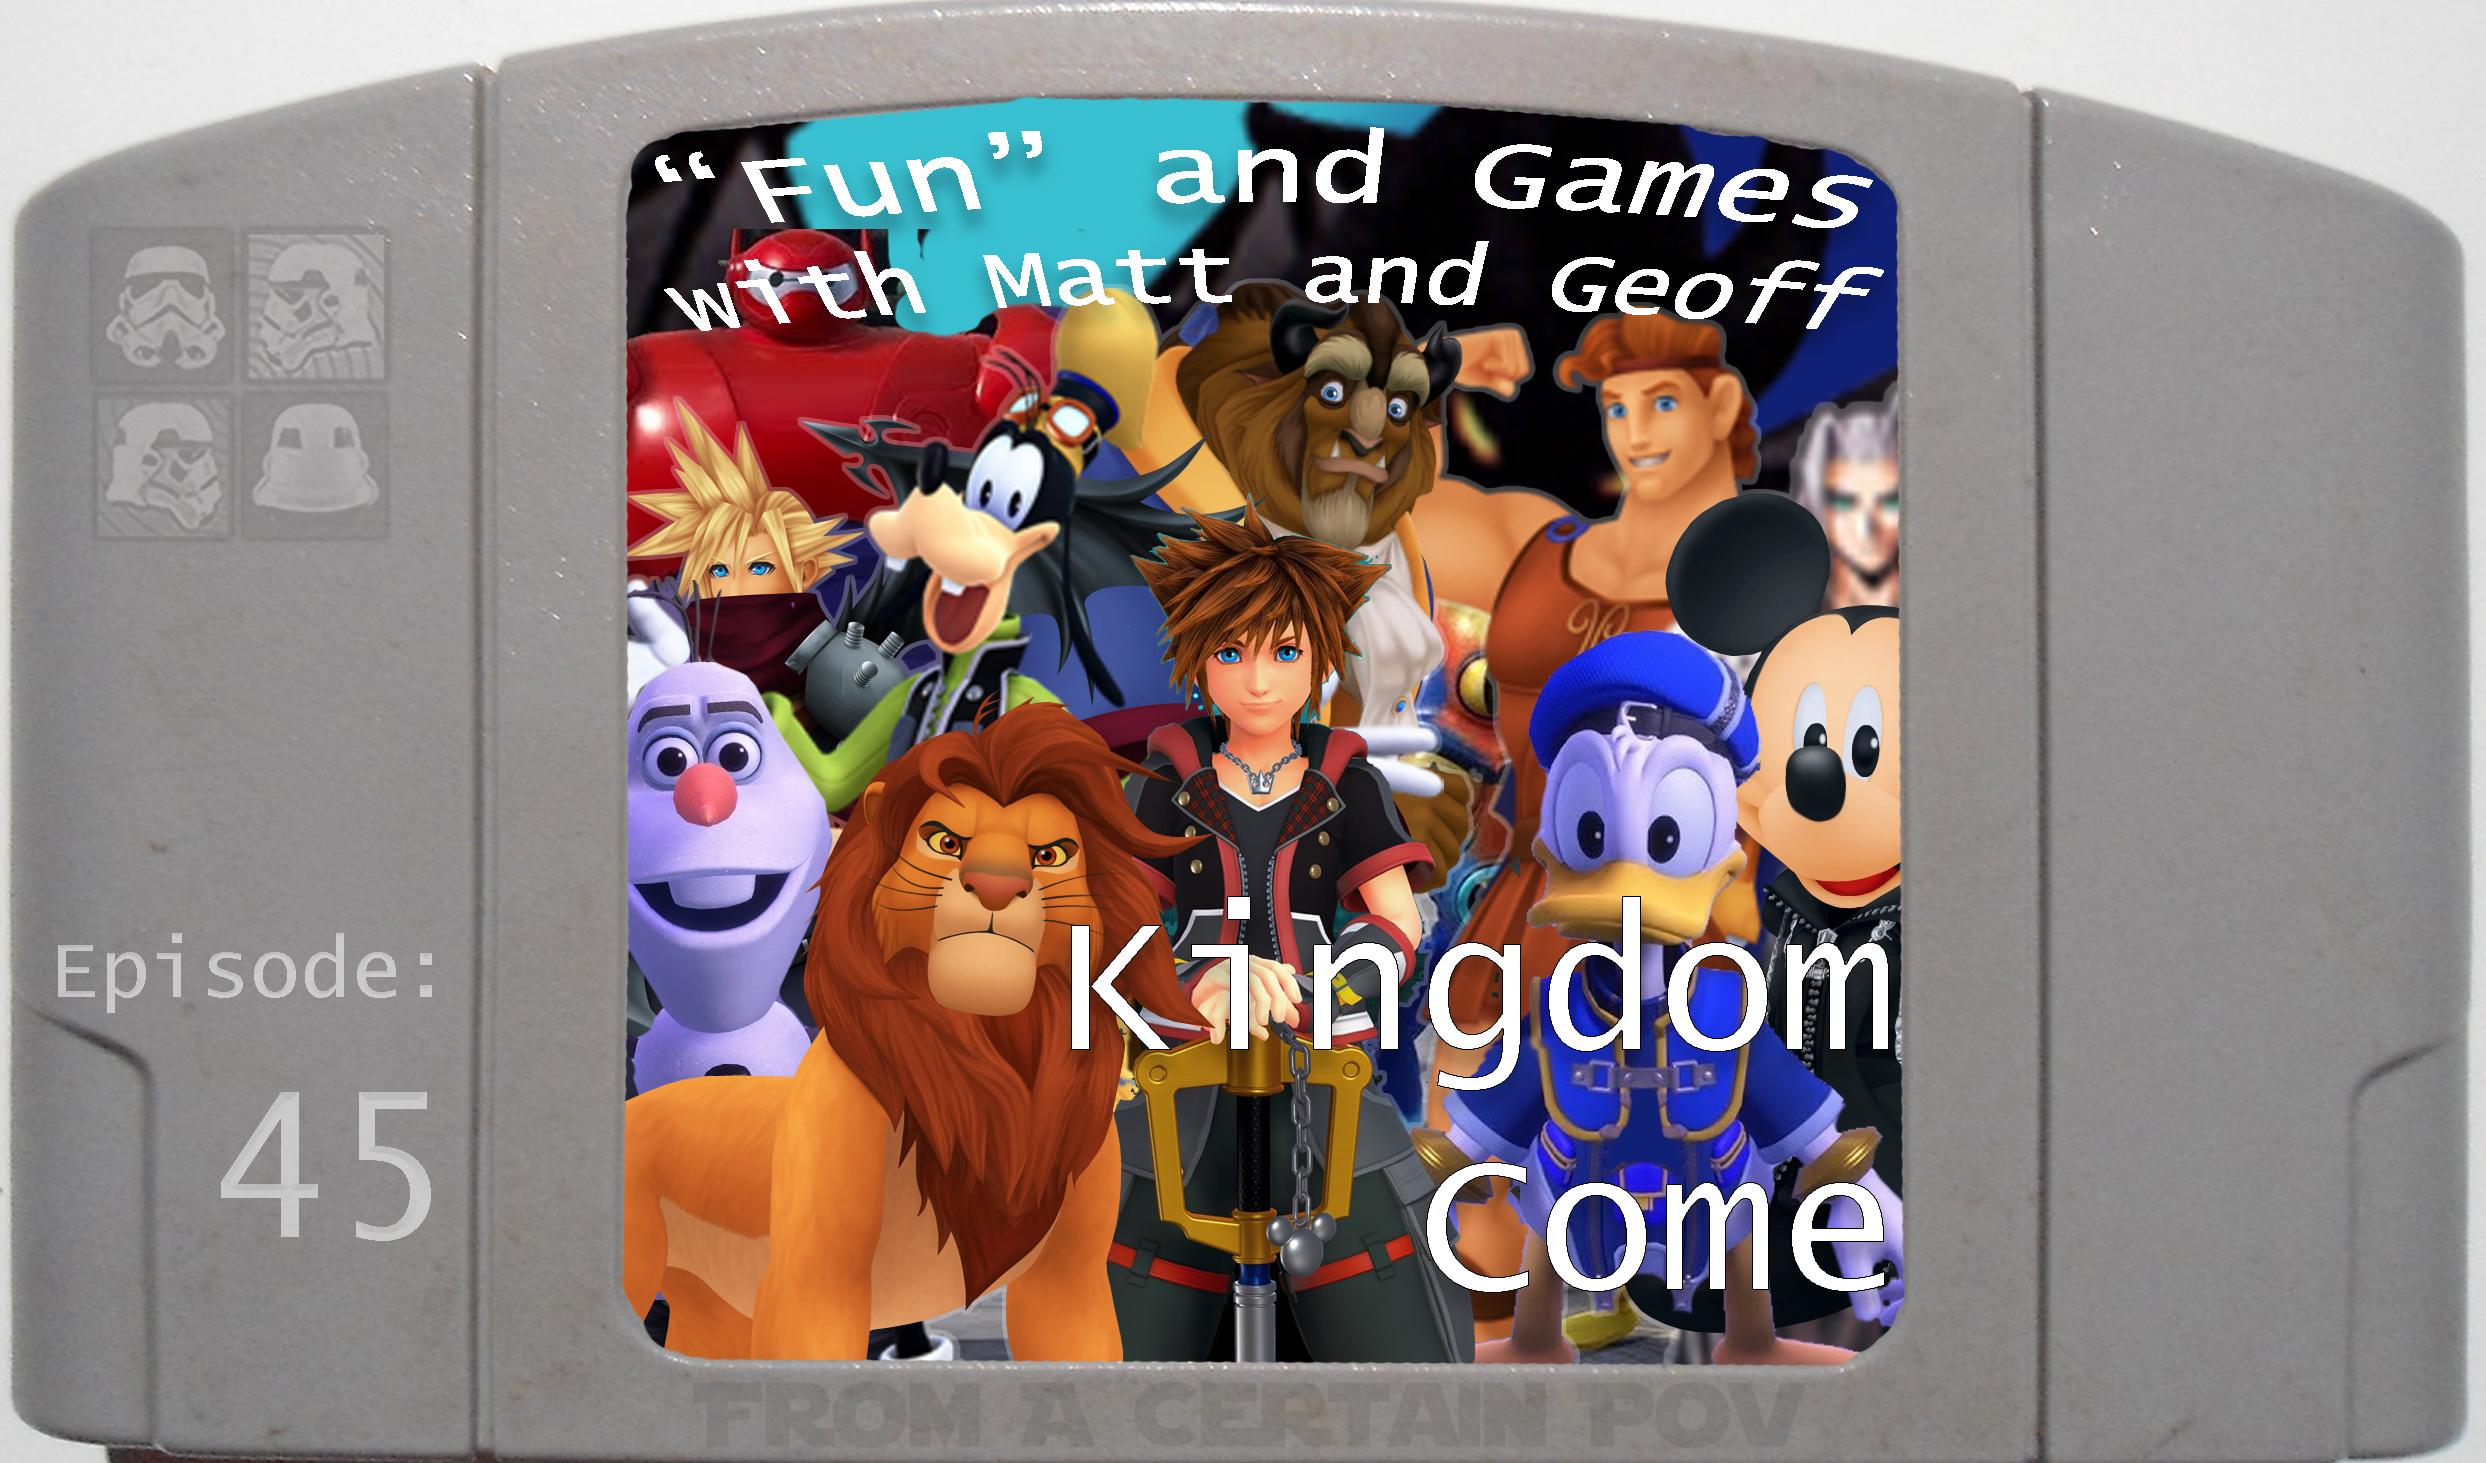 45 - Kingdom Come.jpg